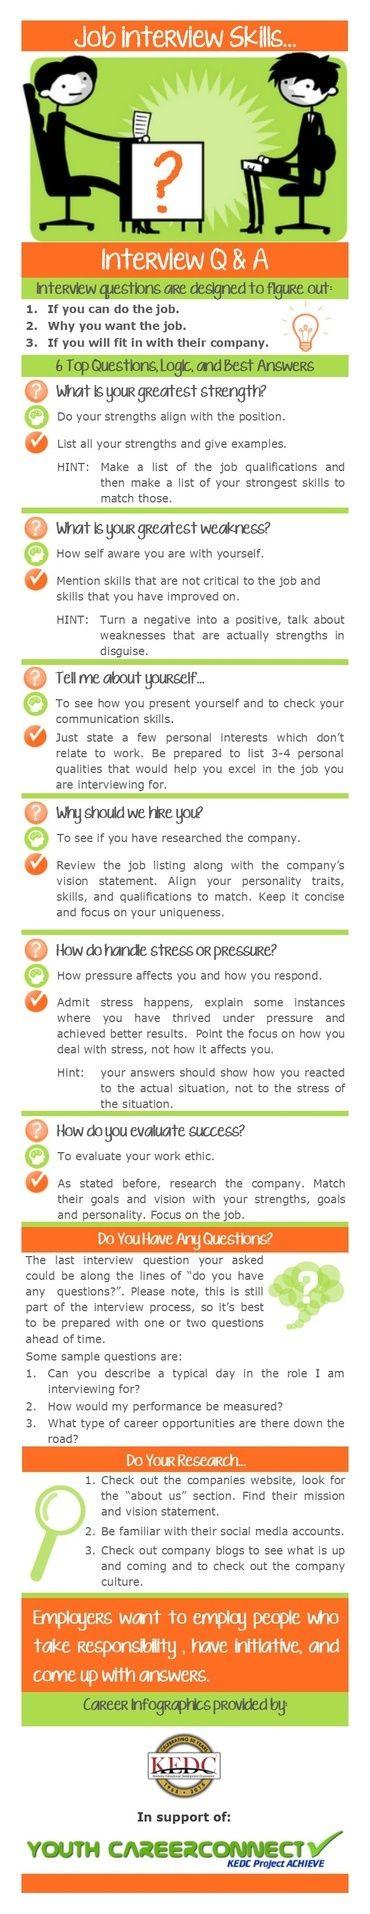 238 best resume interview job images on pinterest interview resume and job interviews